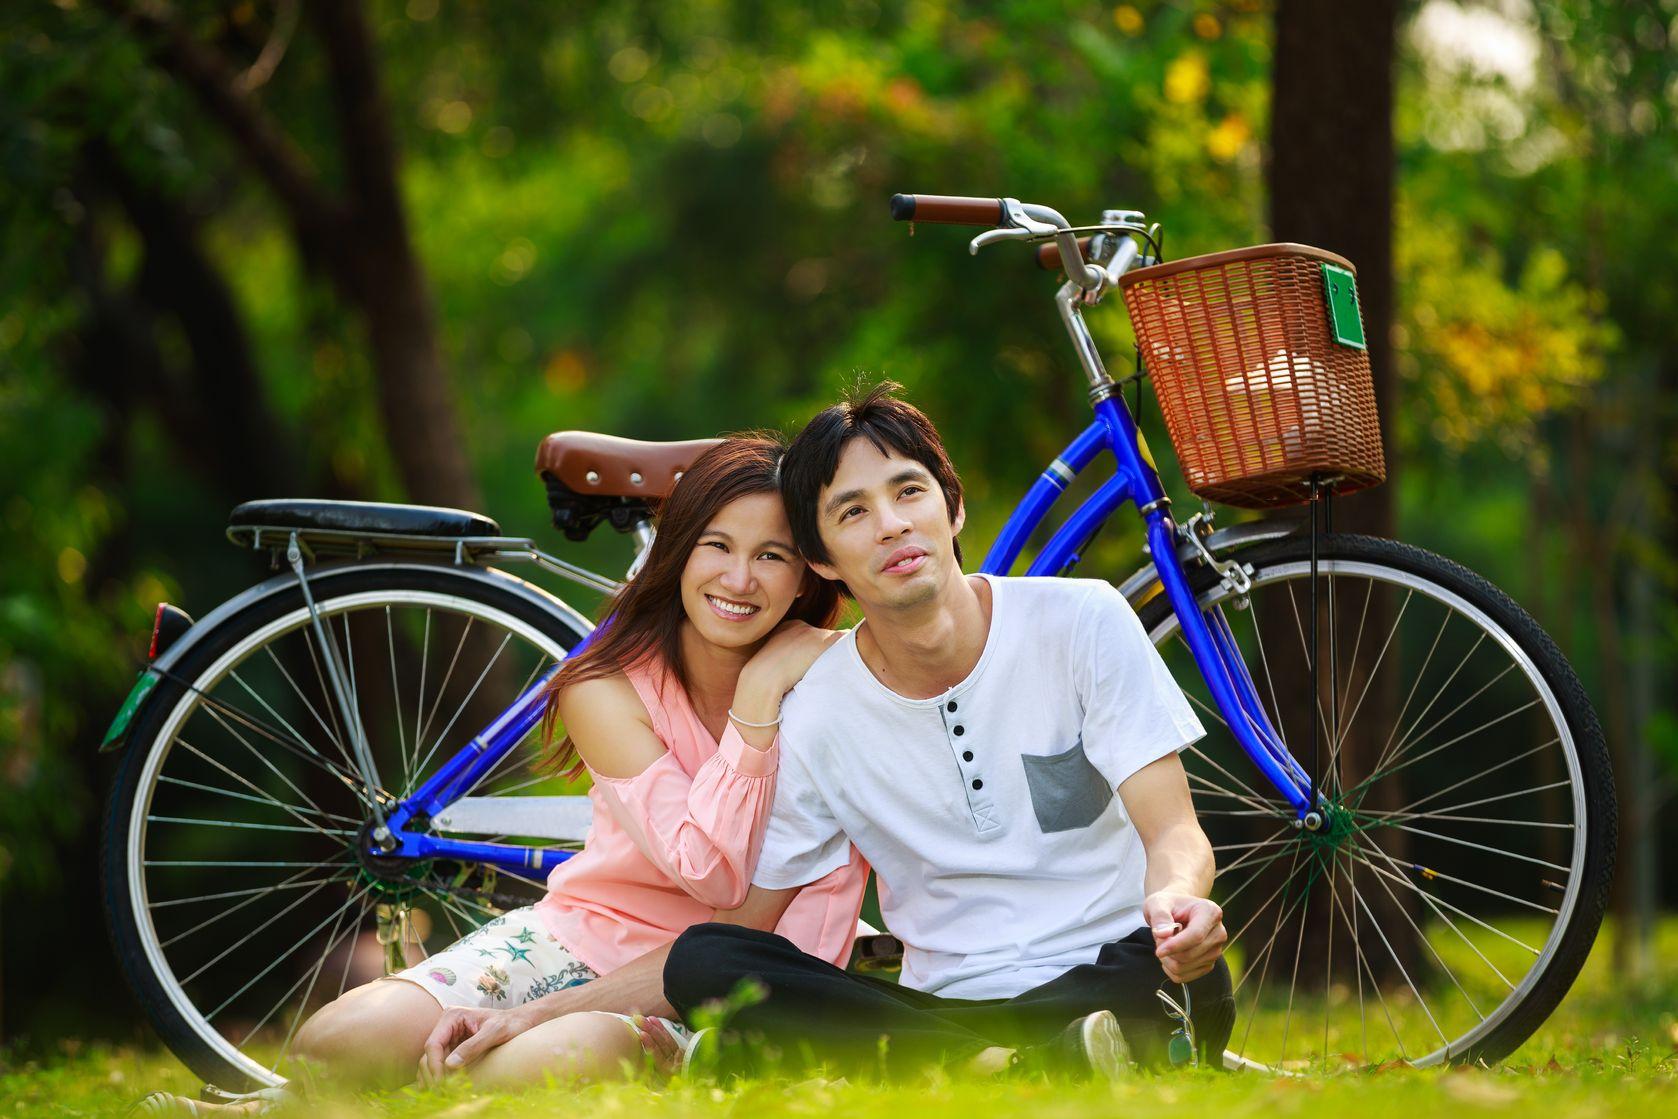 mediterranean speed dating philippines dating scams forum